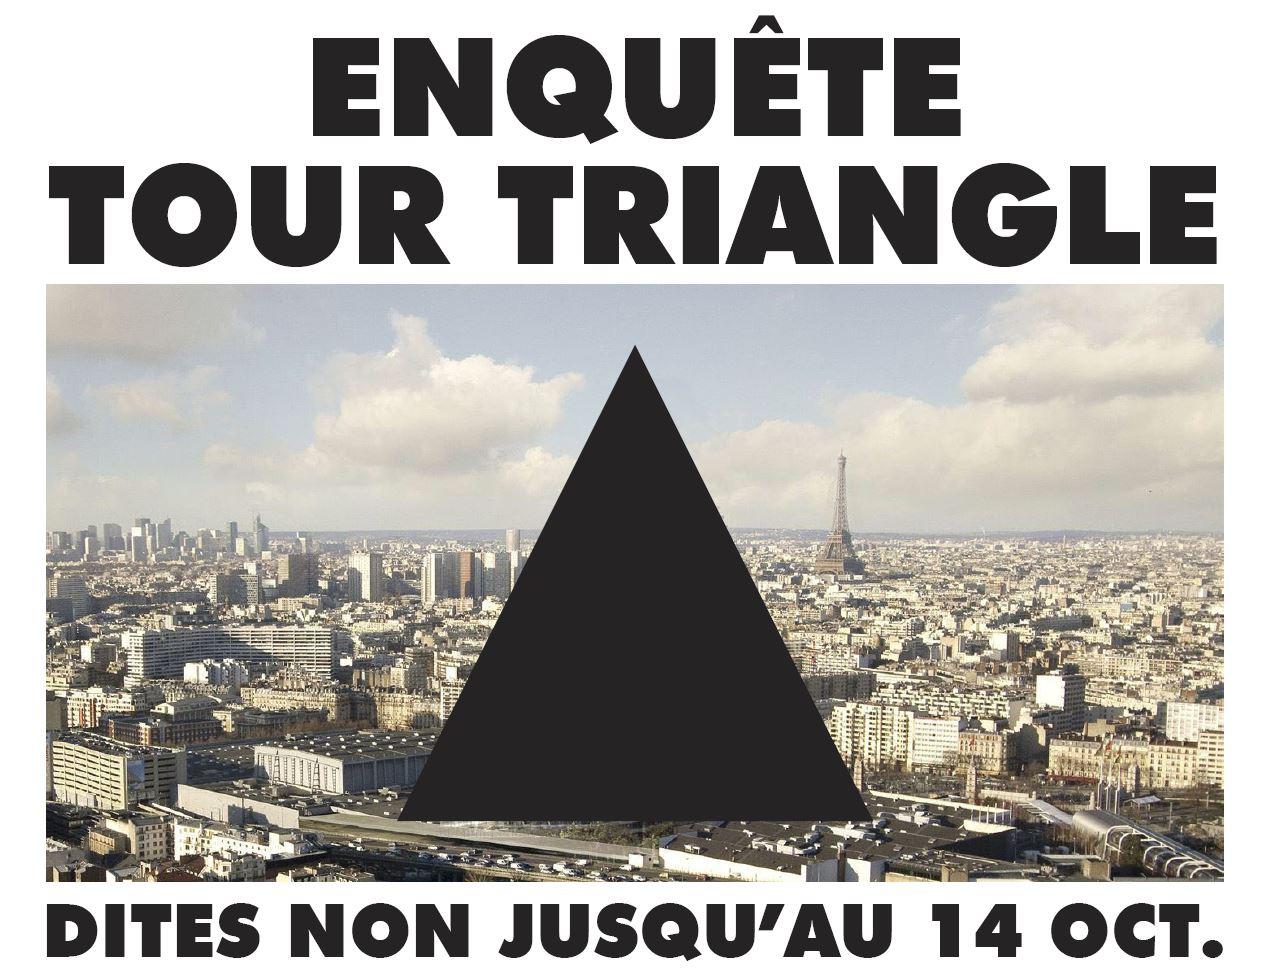 enquete tour triangle - paris - porte de versailles - unibail rodamco - GPII PAris